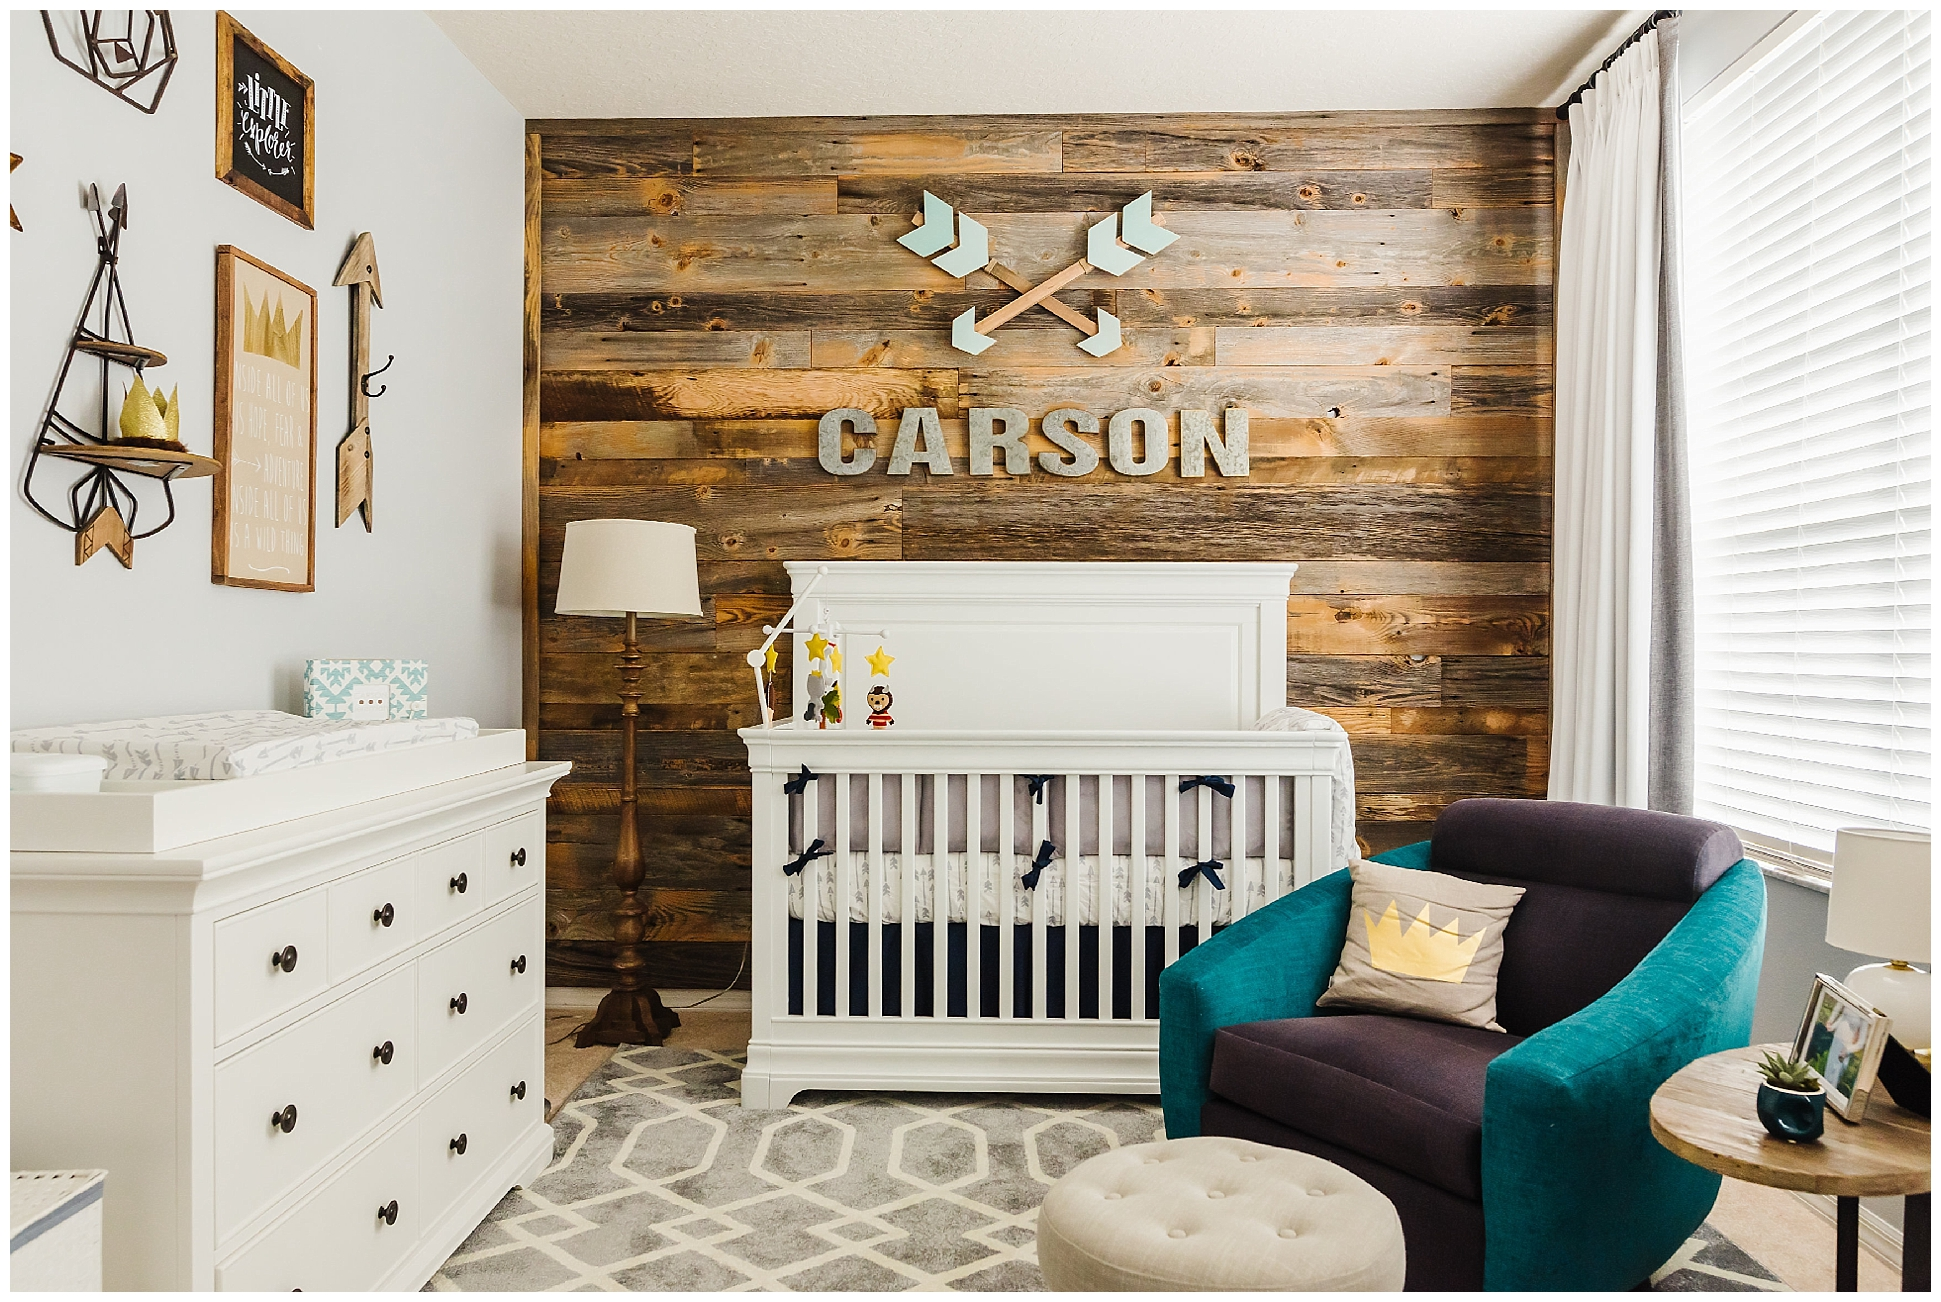 ann-cox-interior-design-nursery-where-the-wild-things-are_1.jpg